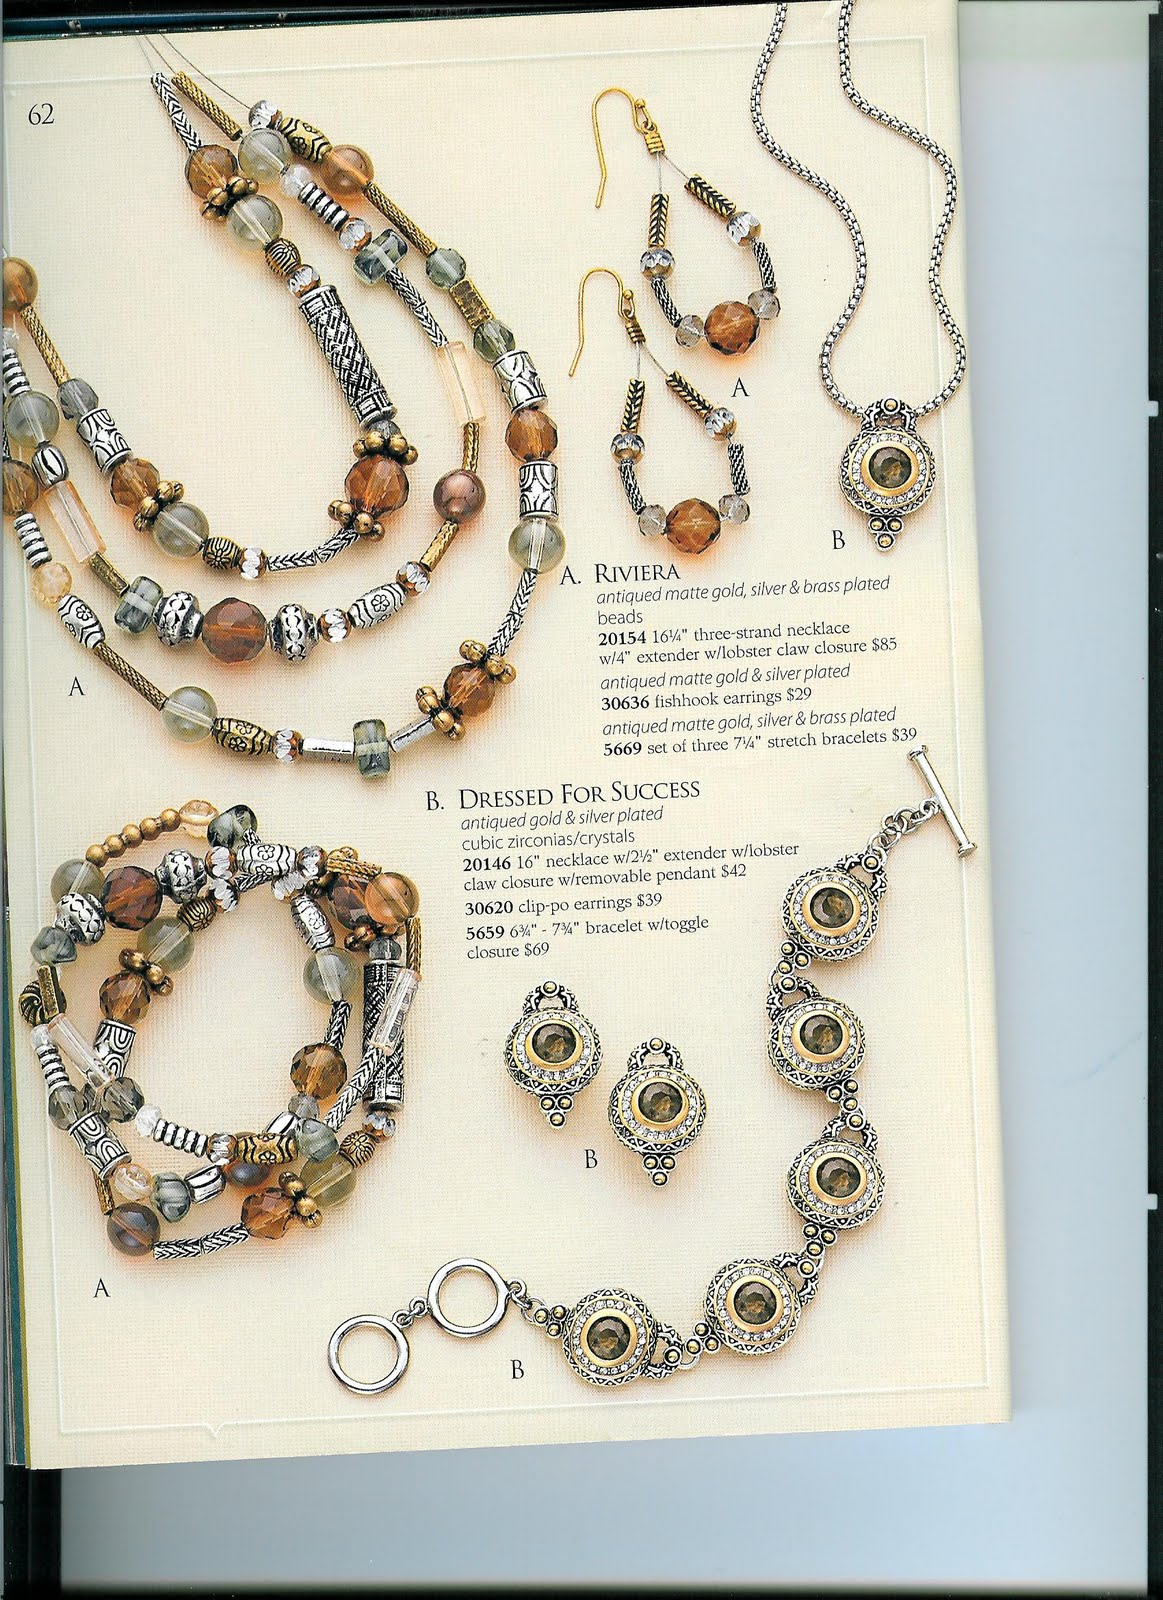 Jewelry diva premier designs catalog part two for Premier designs jewelry images